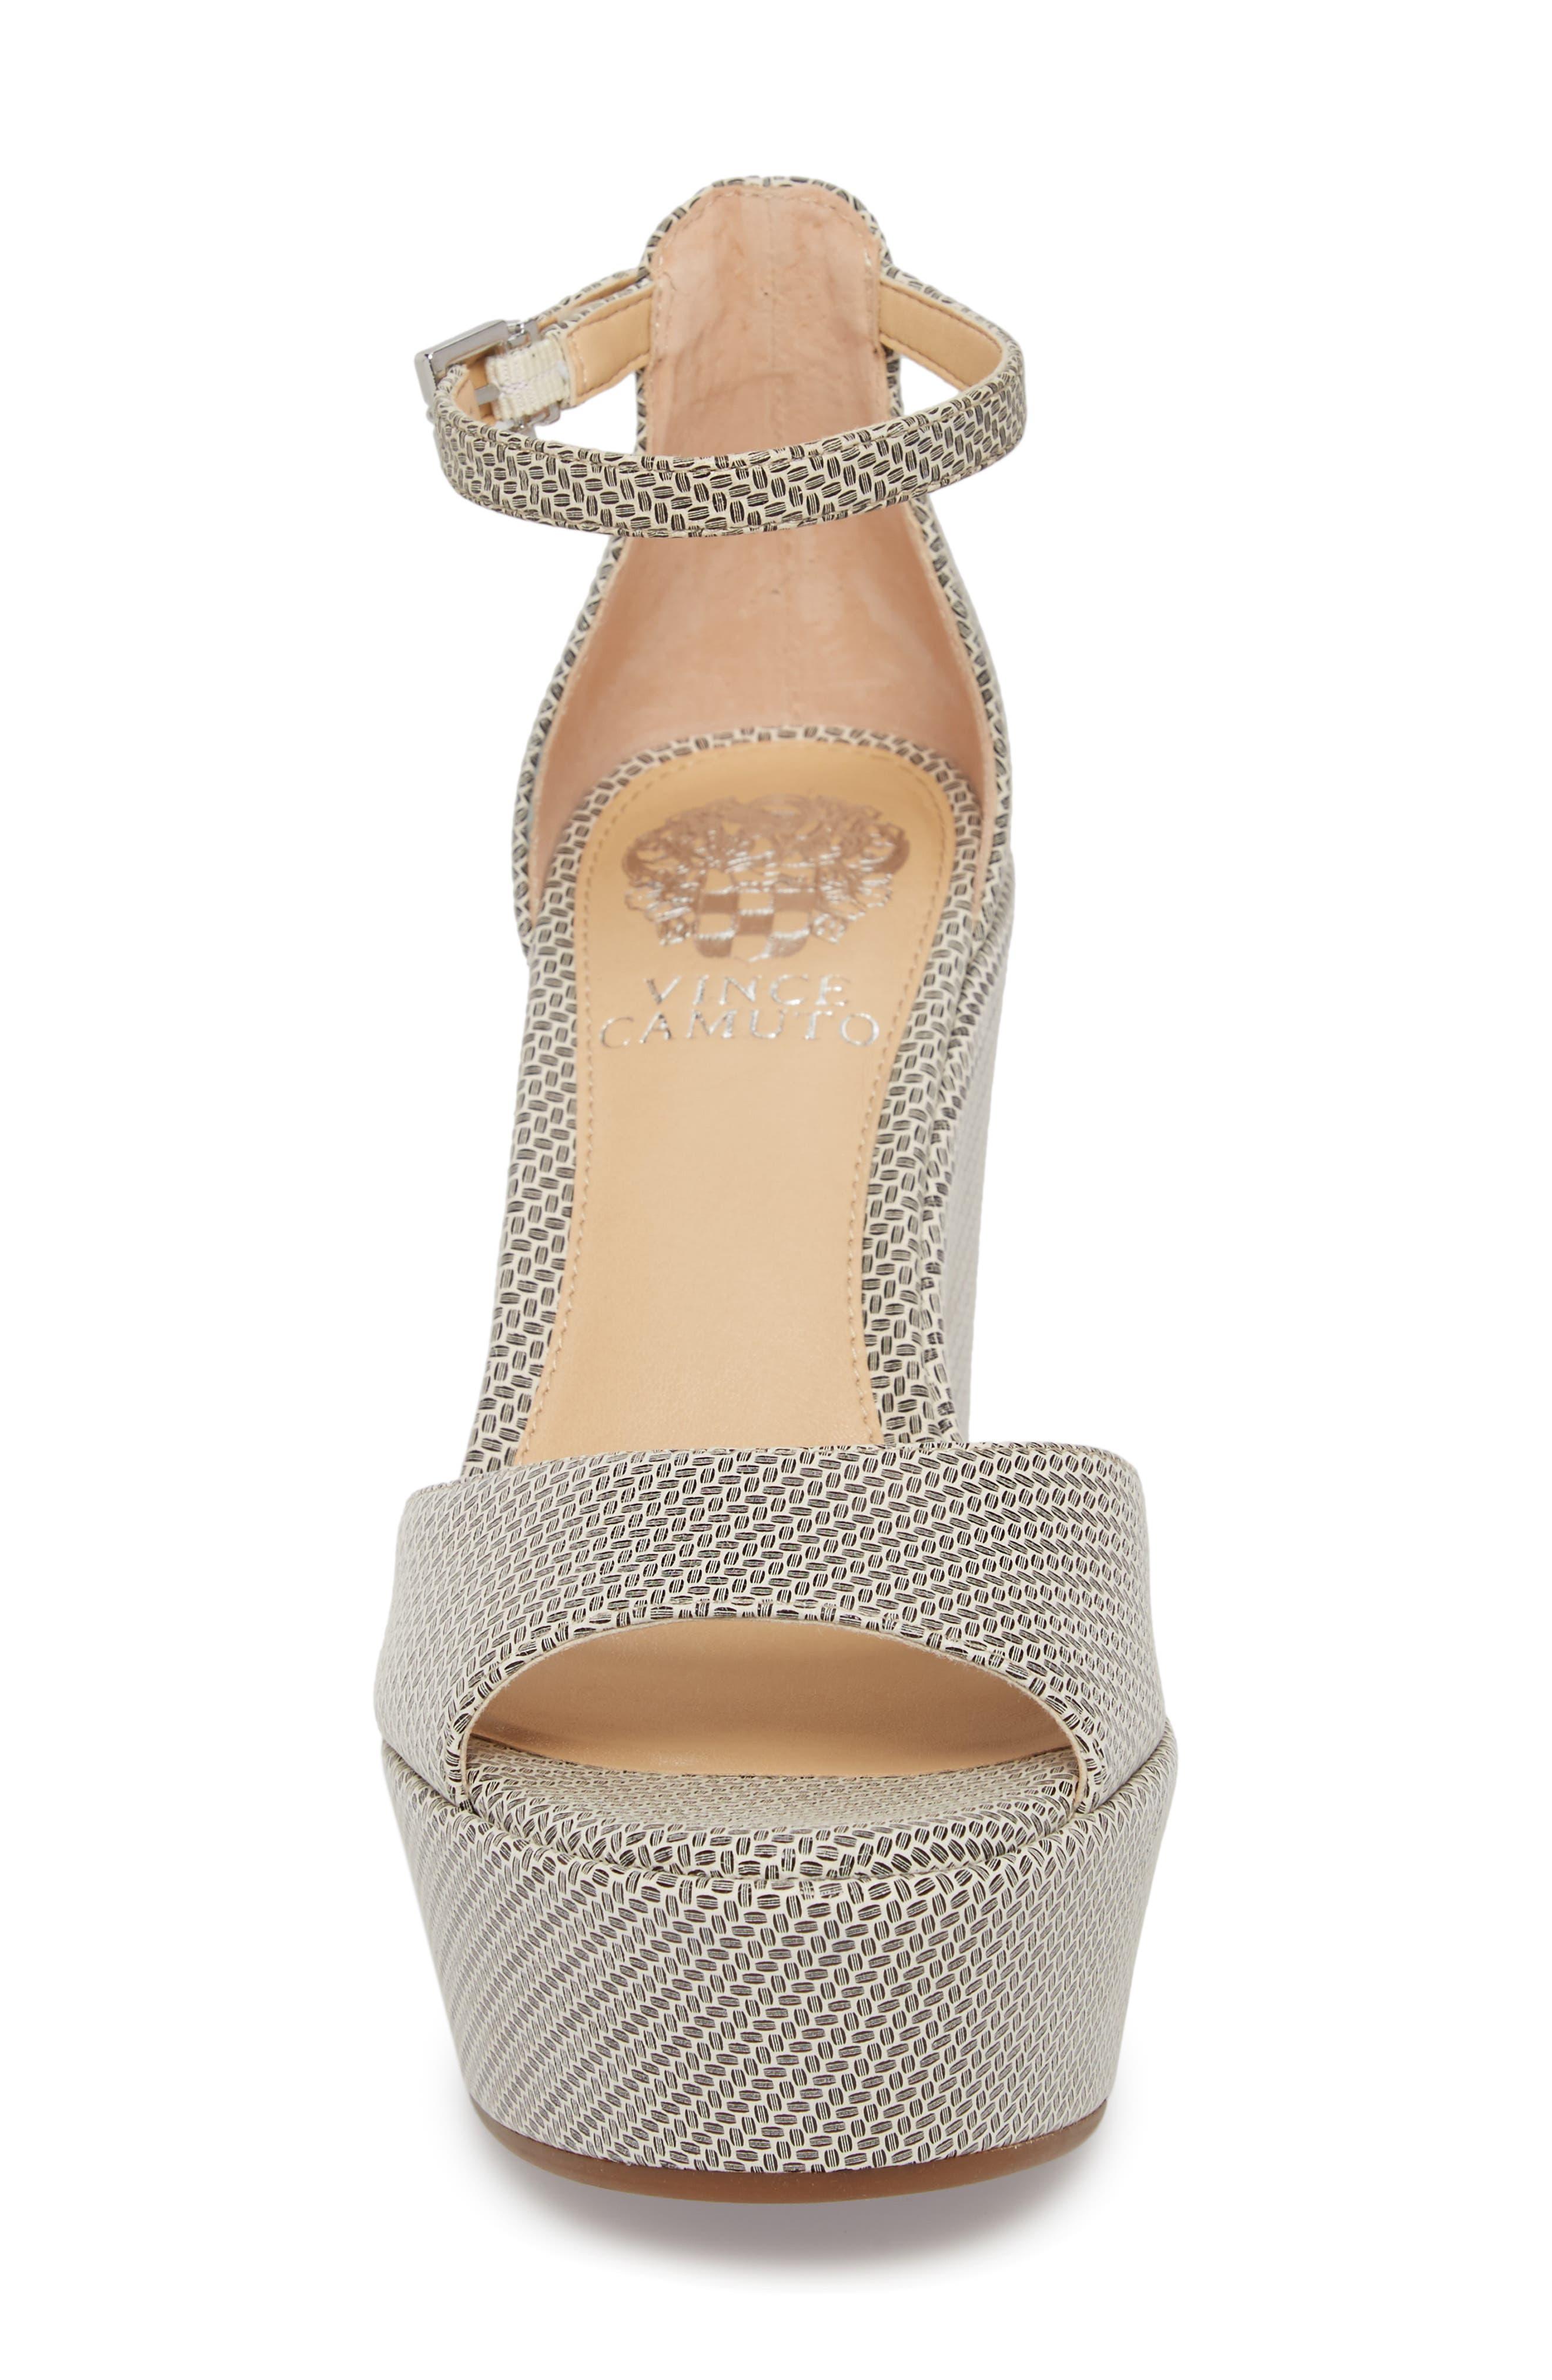 Tatchen Ankle Strap Platform Sandal,                             Alternate thumbnail 4, color,                             002